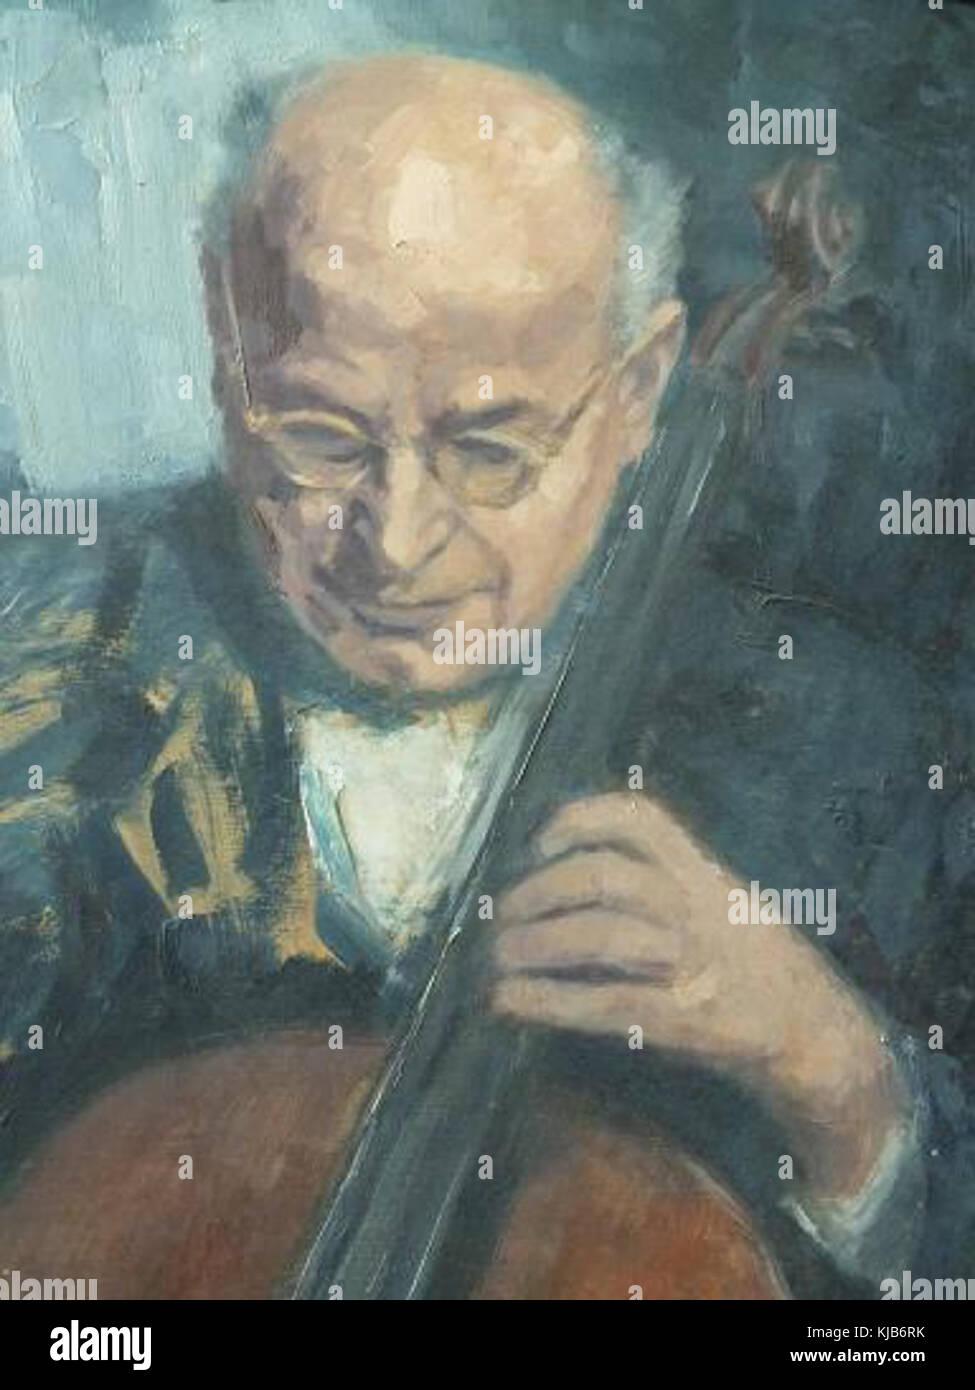 Josef wagnes gemalt klein - Stock Image